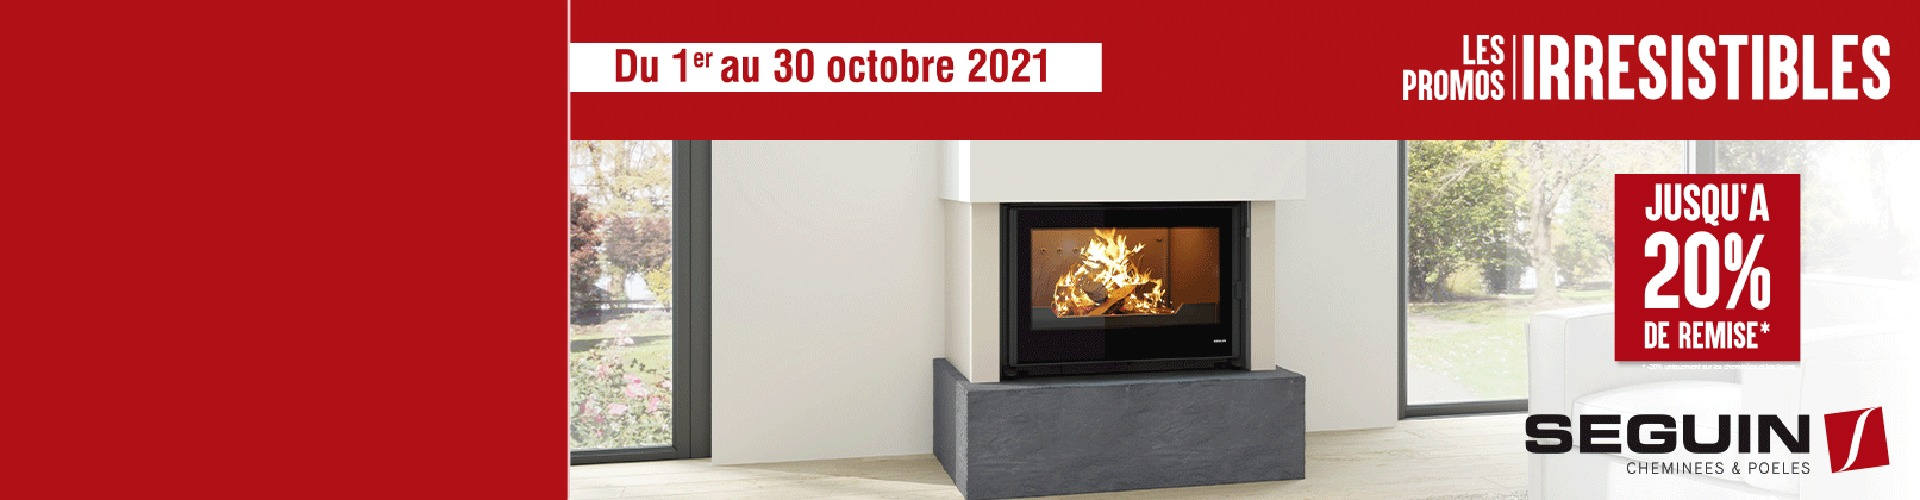 promos-irresistibles-octobre-2021-seguin-91-cheminee-poele-modele-maya